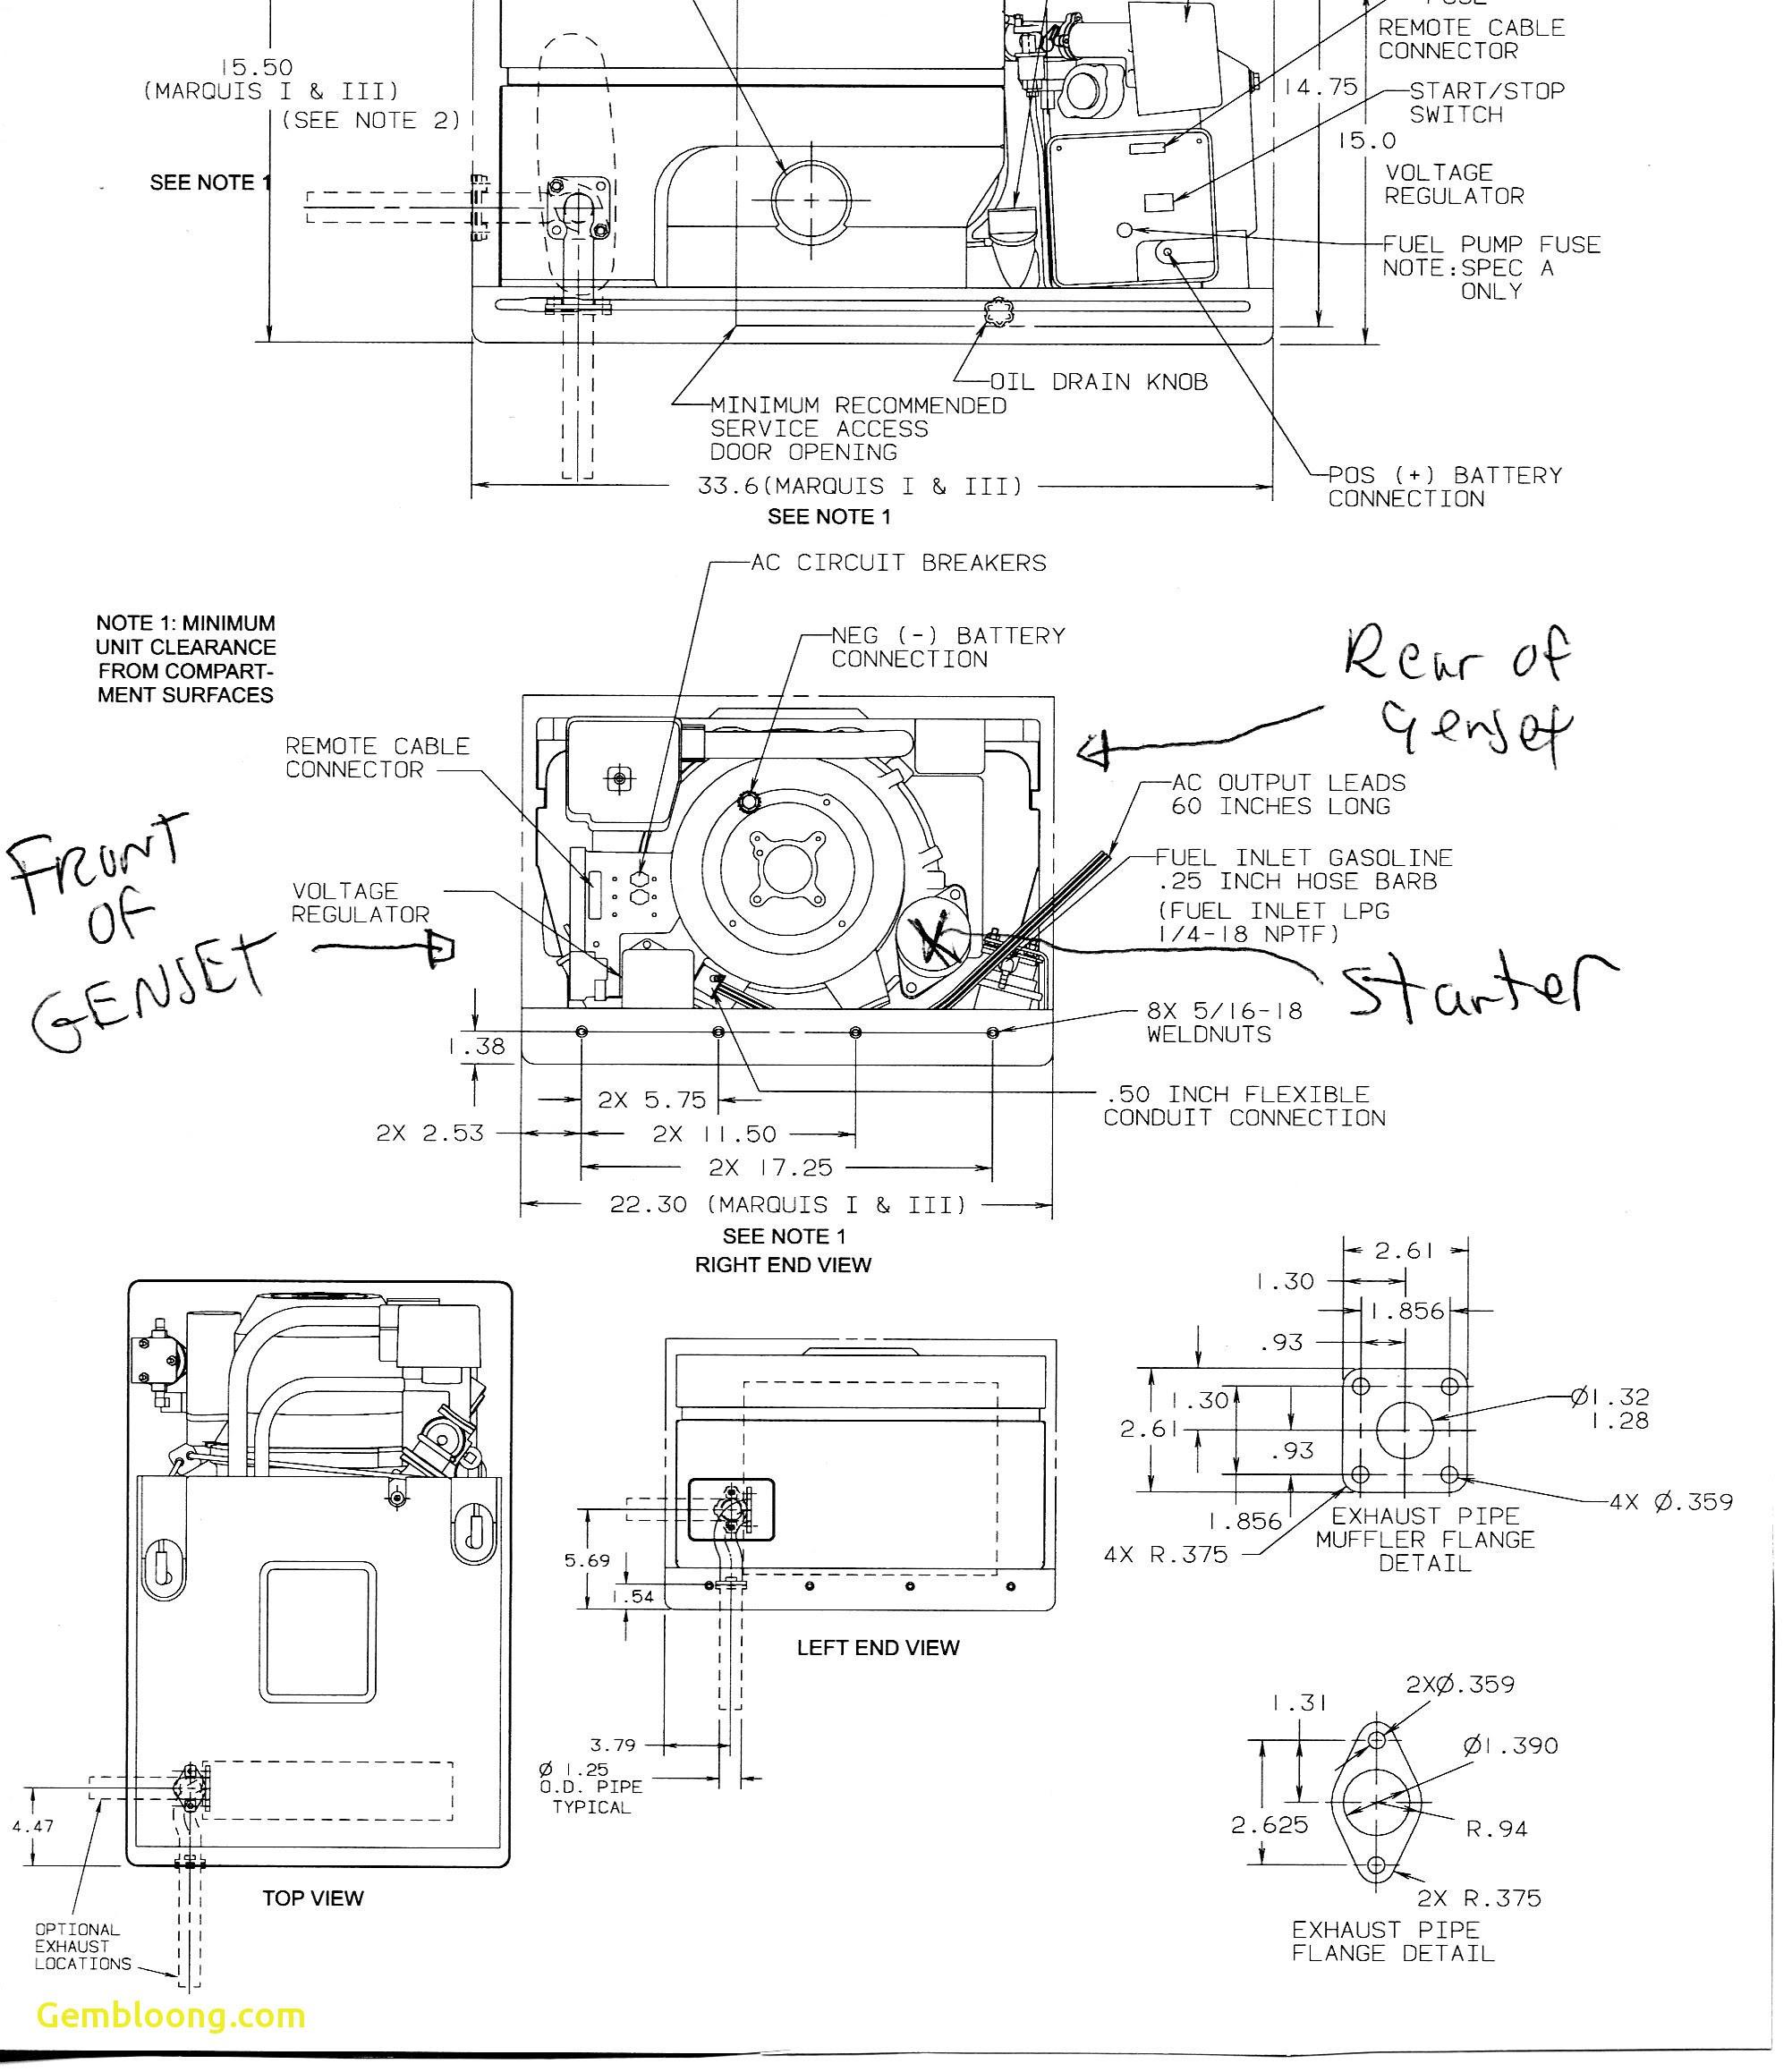 Diagram Onan 4kw Generator Wiring Diagram Full Version Hd Quality Wiring Diagram Diagrambrehmp Beppecacopardo It